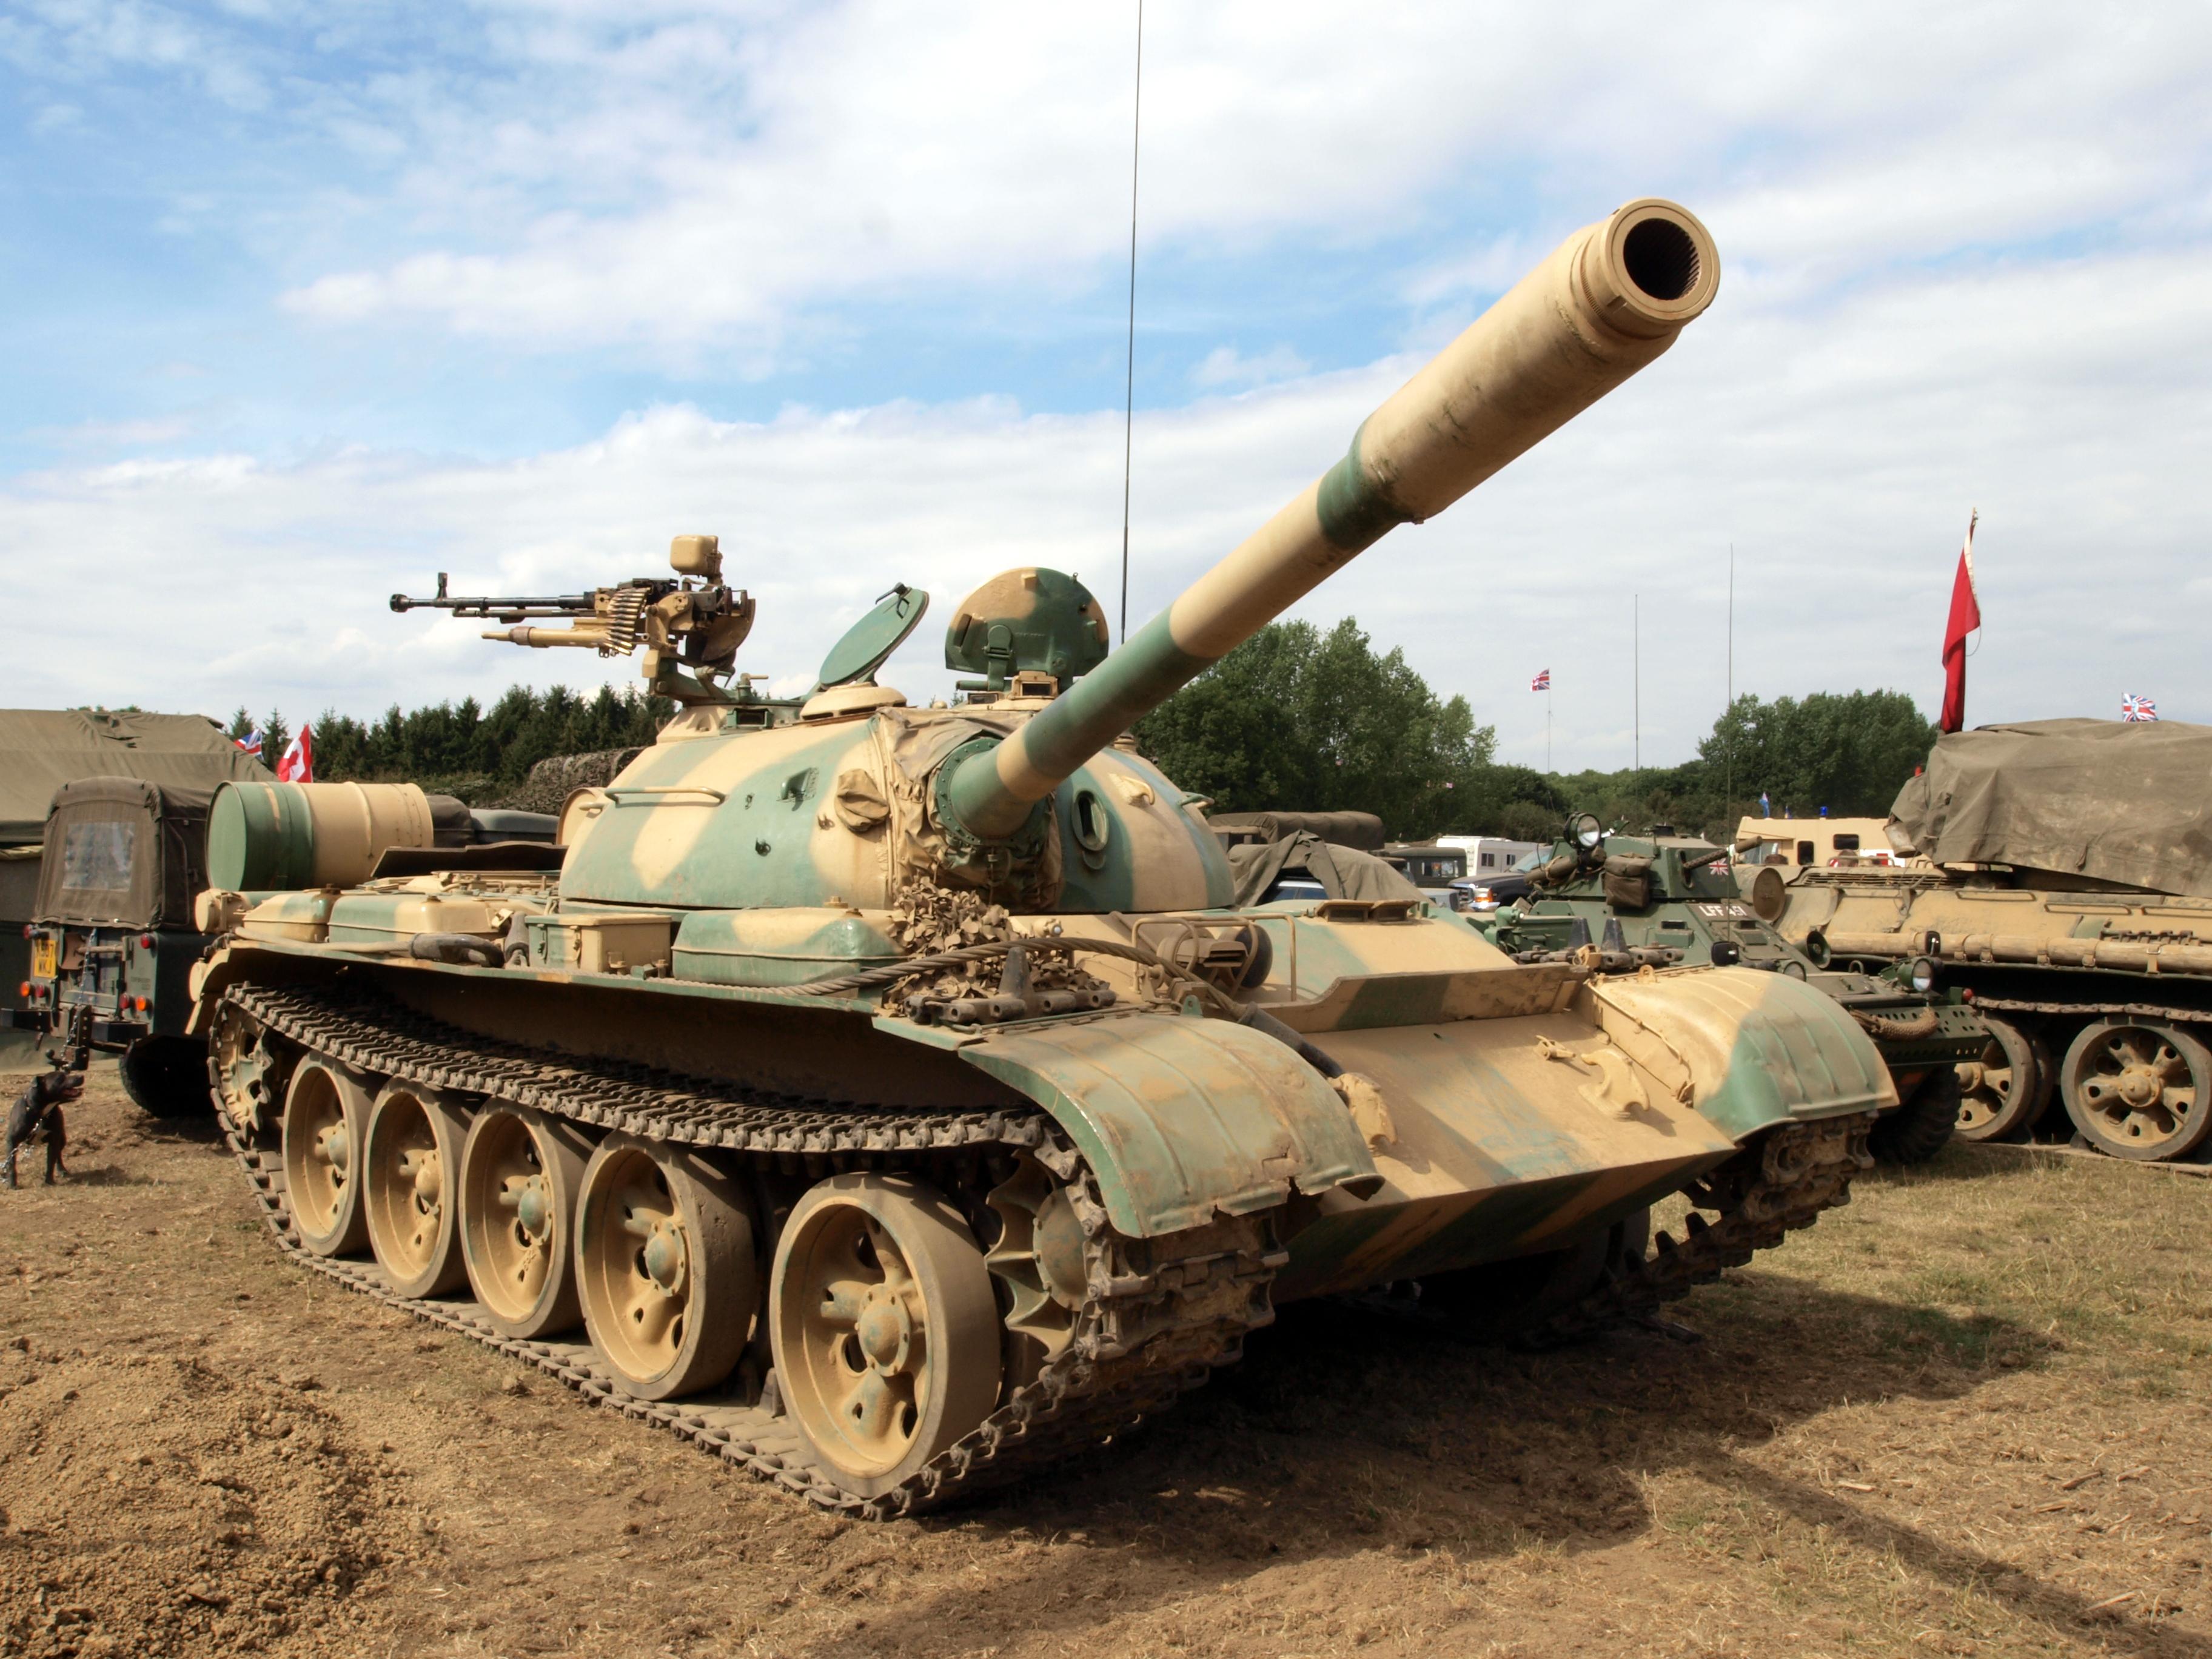 Type 59 tank